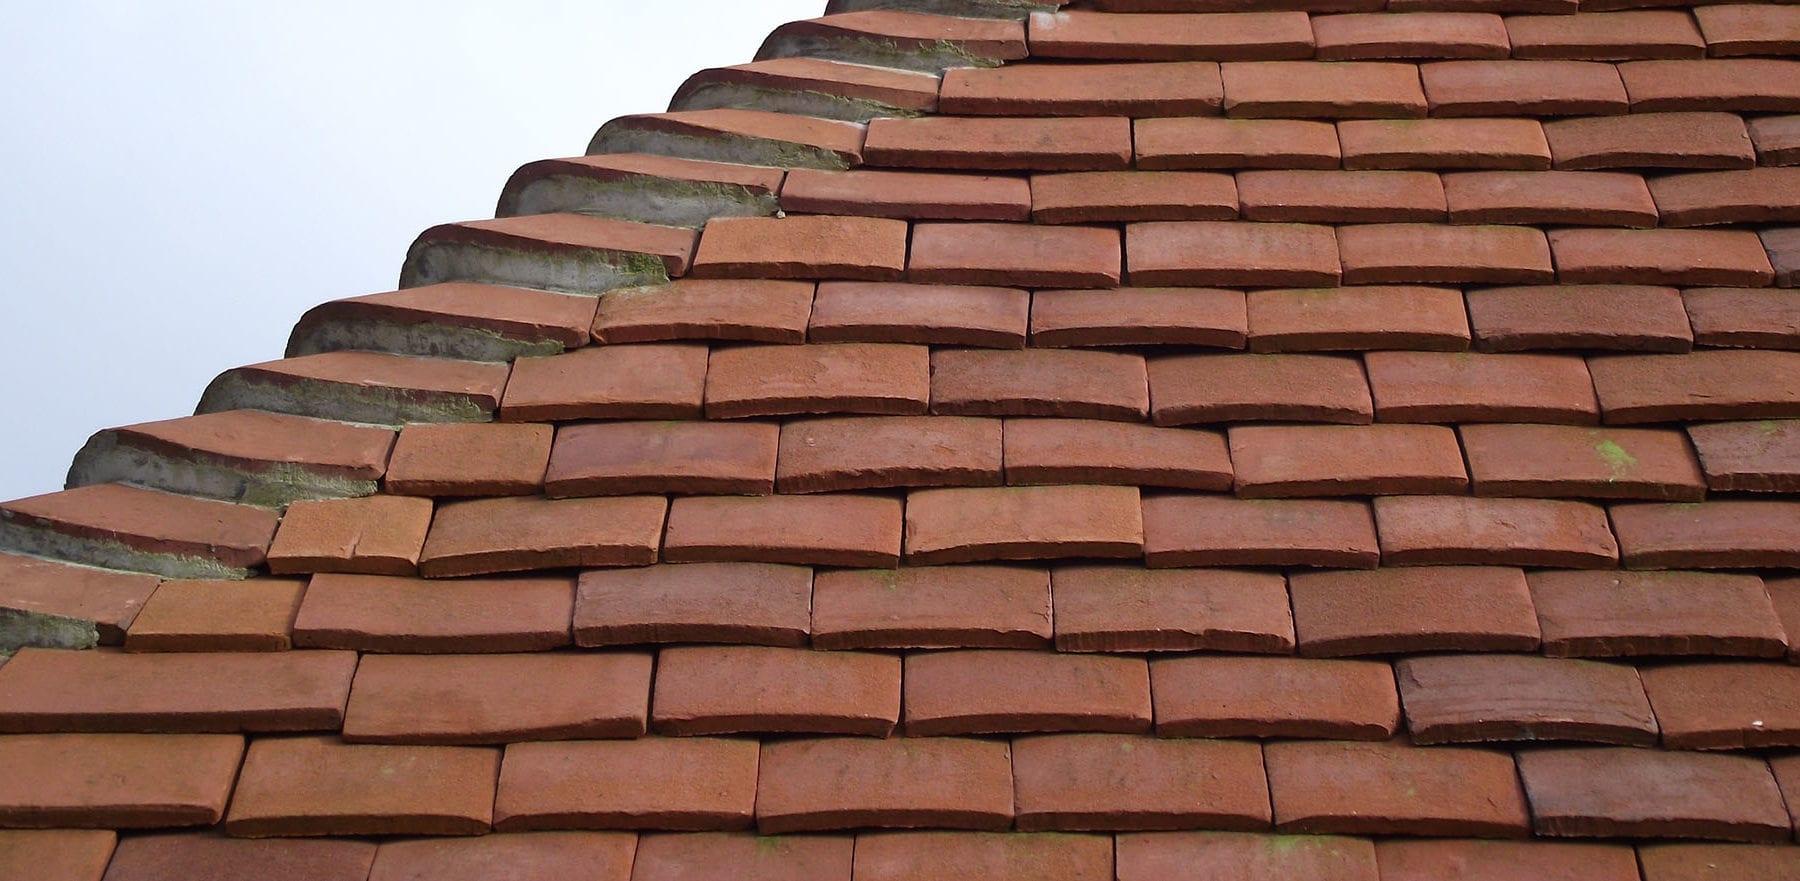 Lifestiles - Handmade Orange Clay Roof Tiles - Baughurst, England 7